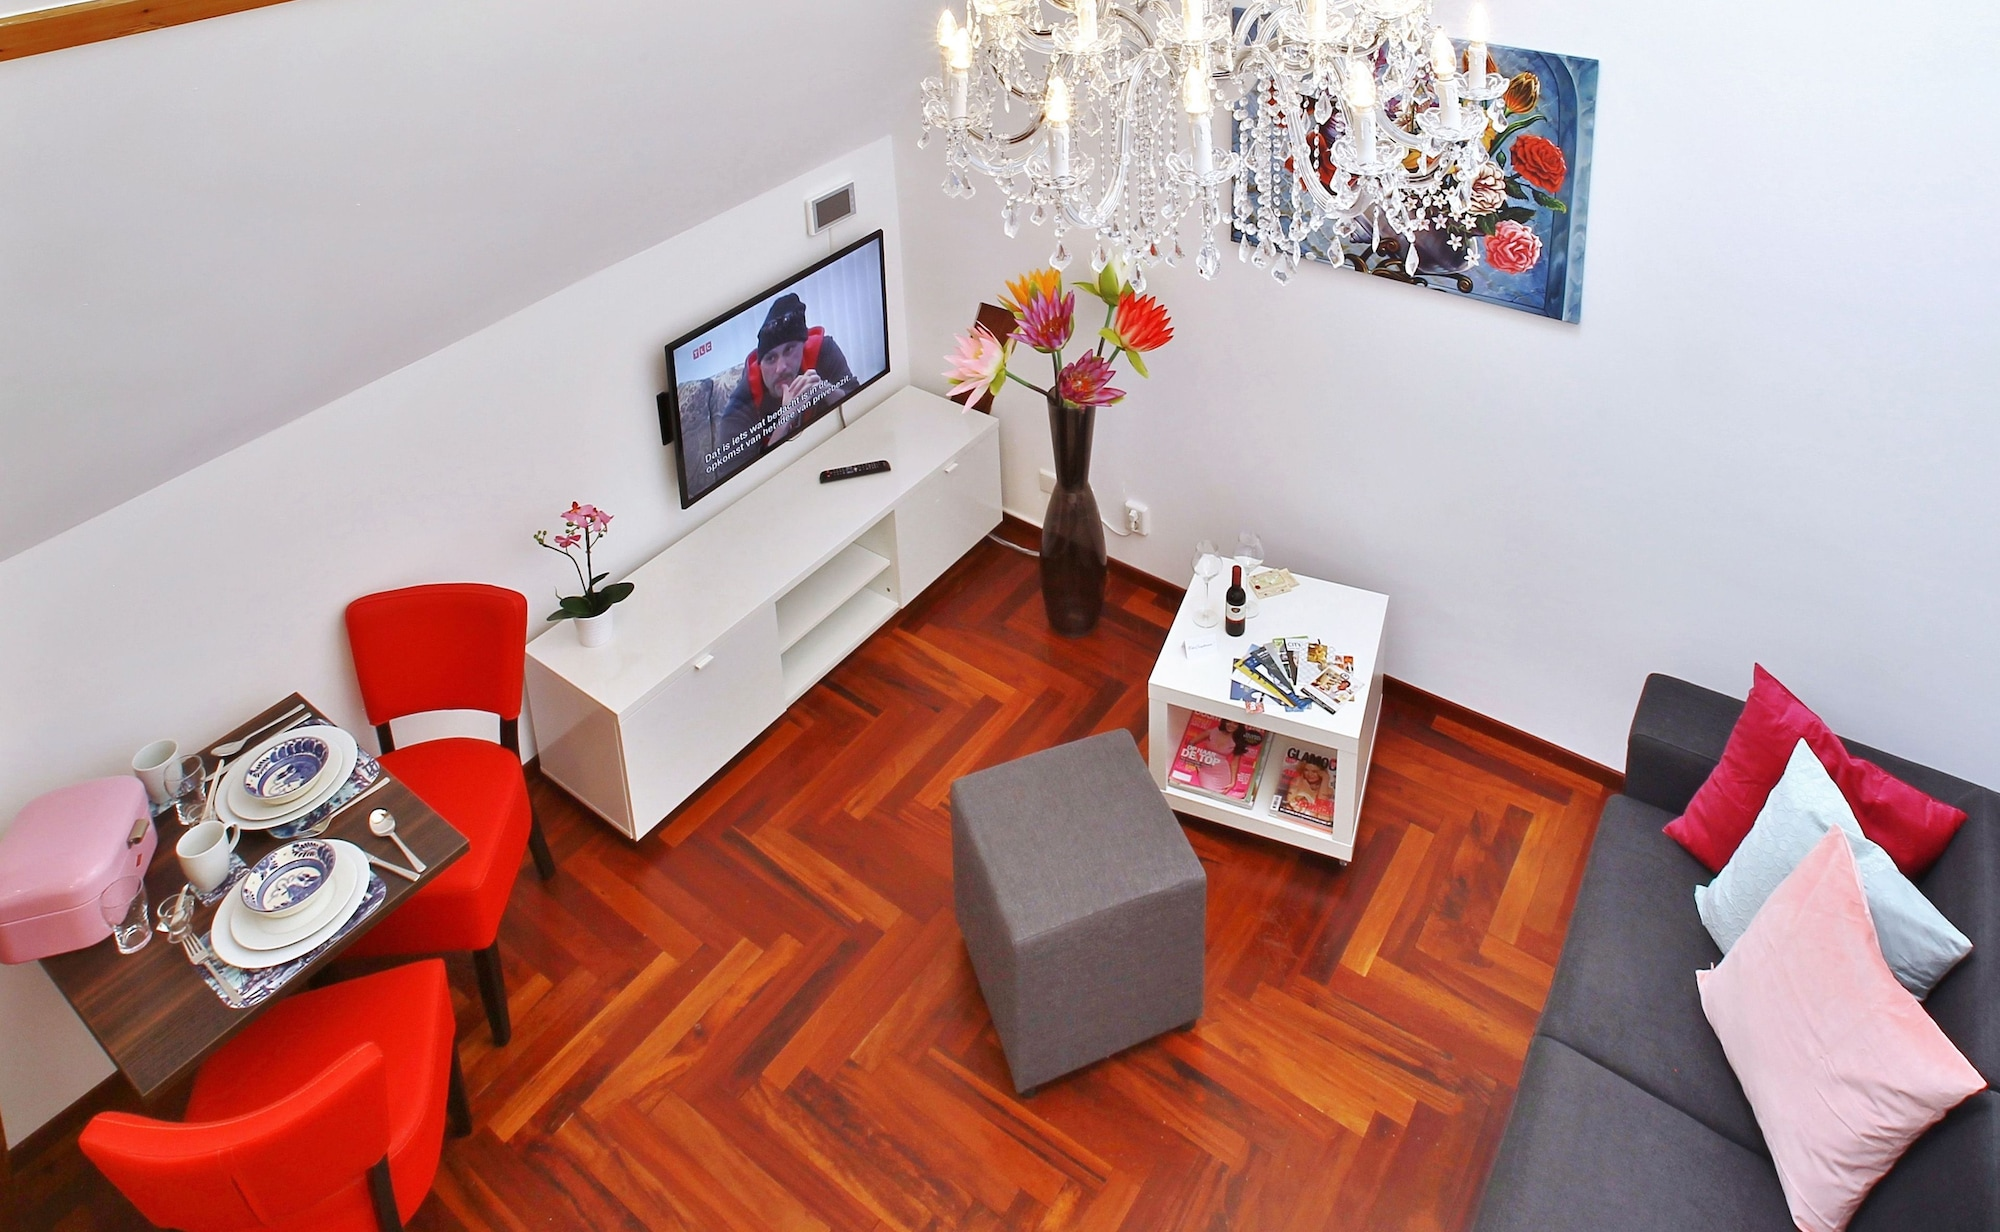 Luxury Apartments Delft - Golden Heart, Delft